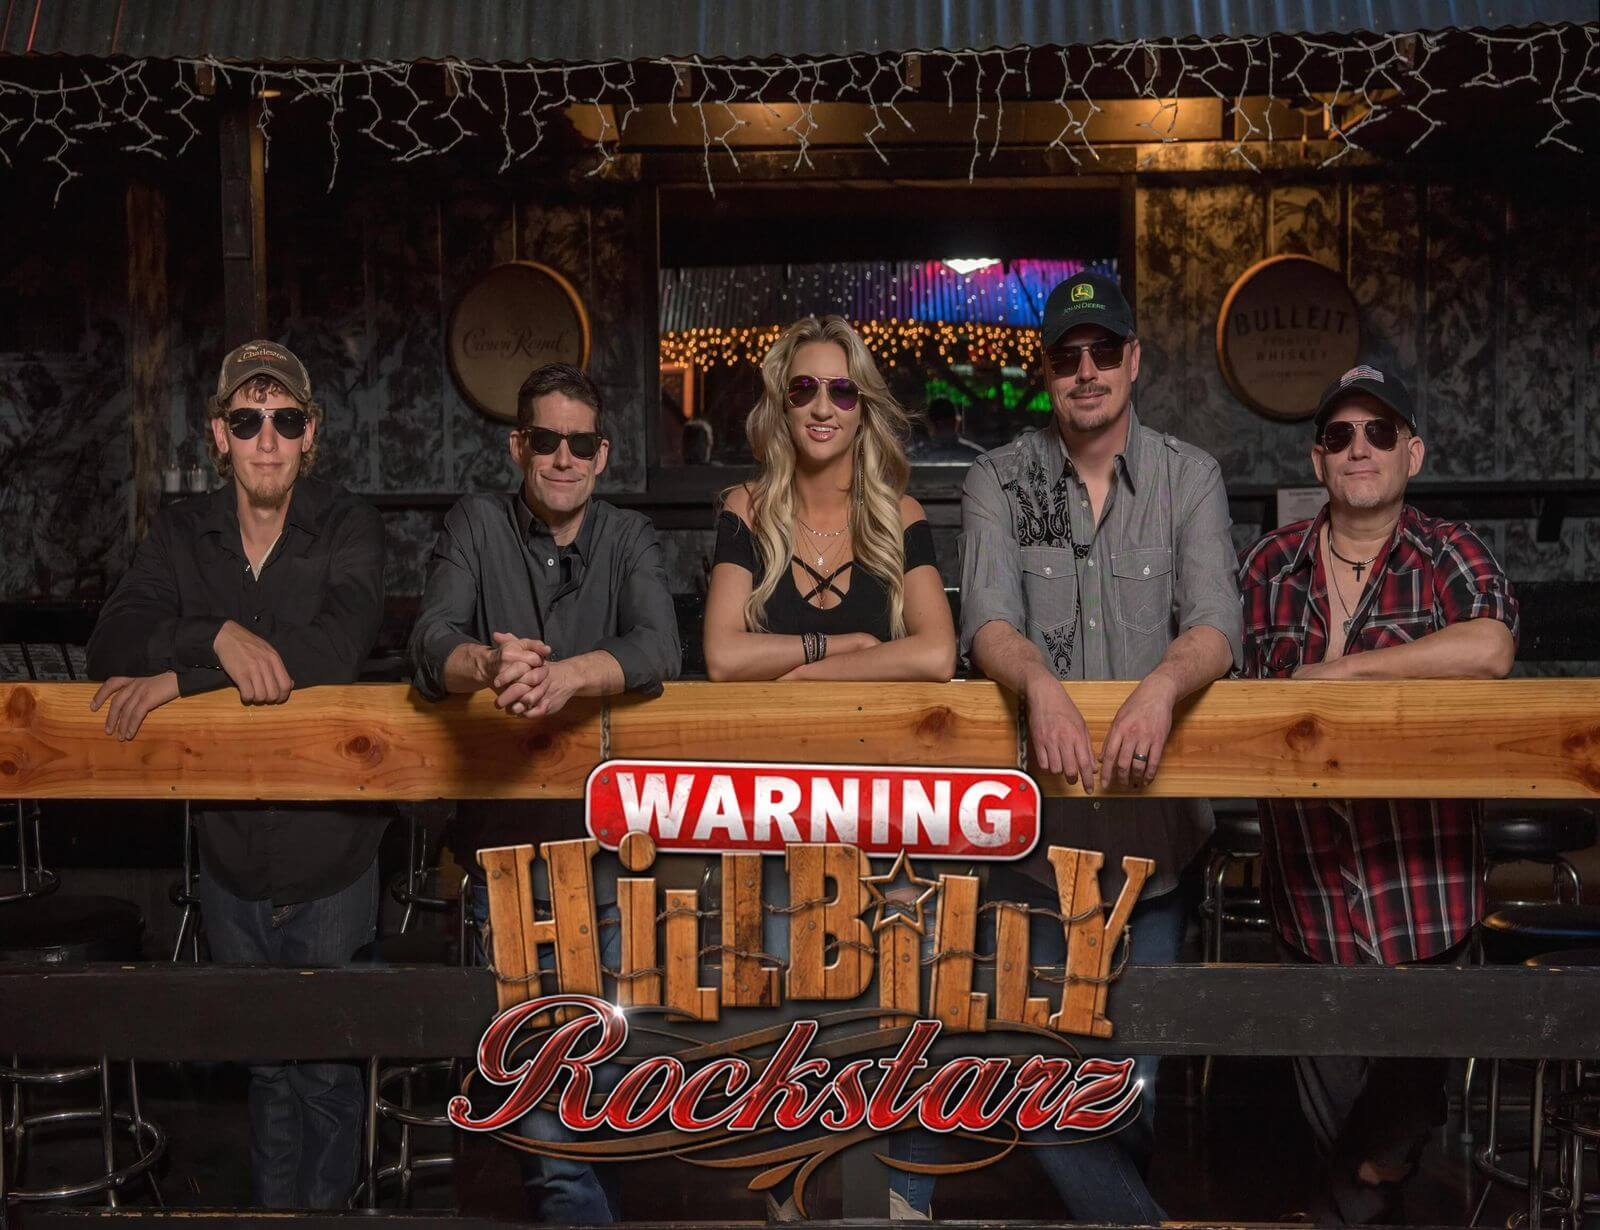 Hillbilly Rockstarz